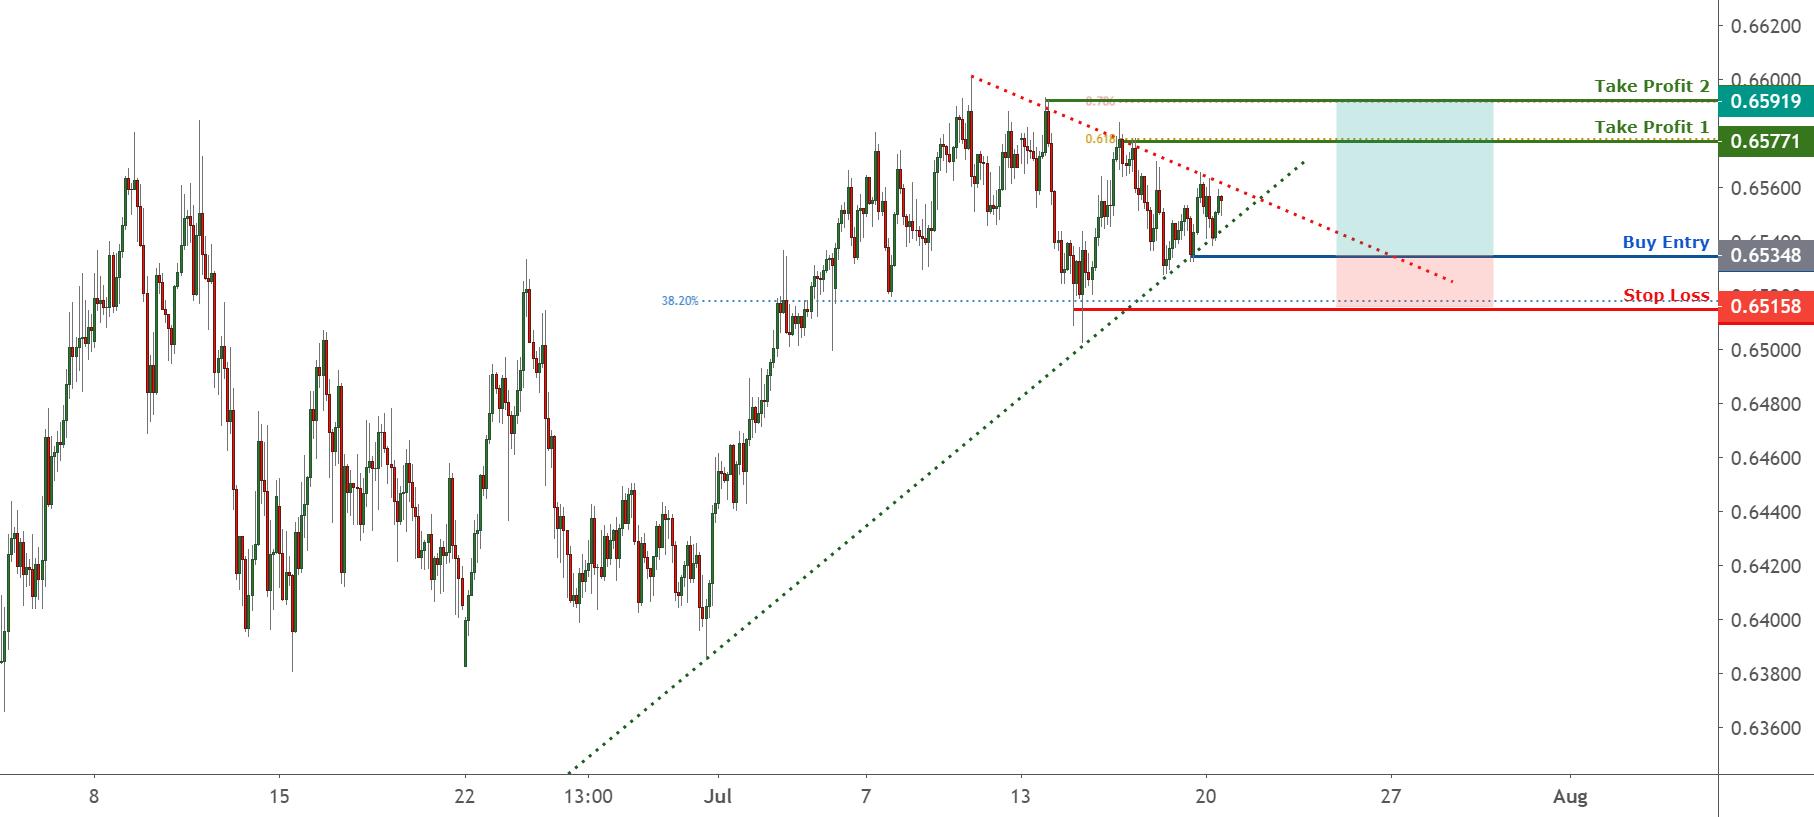 LONG NZDUSD on a rising trend !  20 July for FX:NZDUSD by FXCM